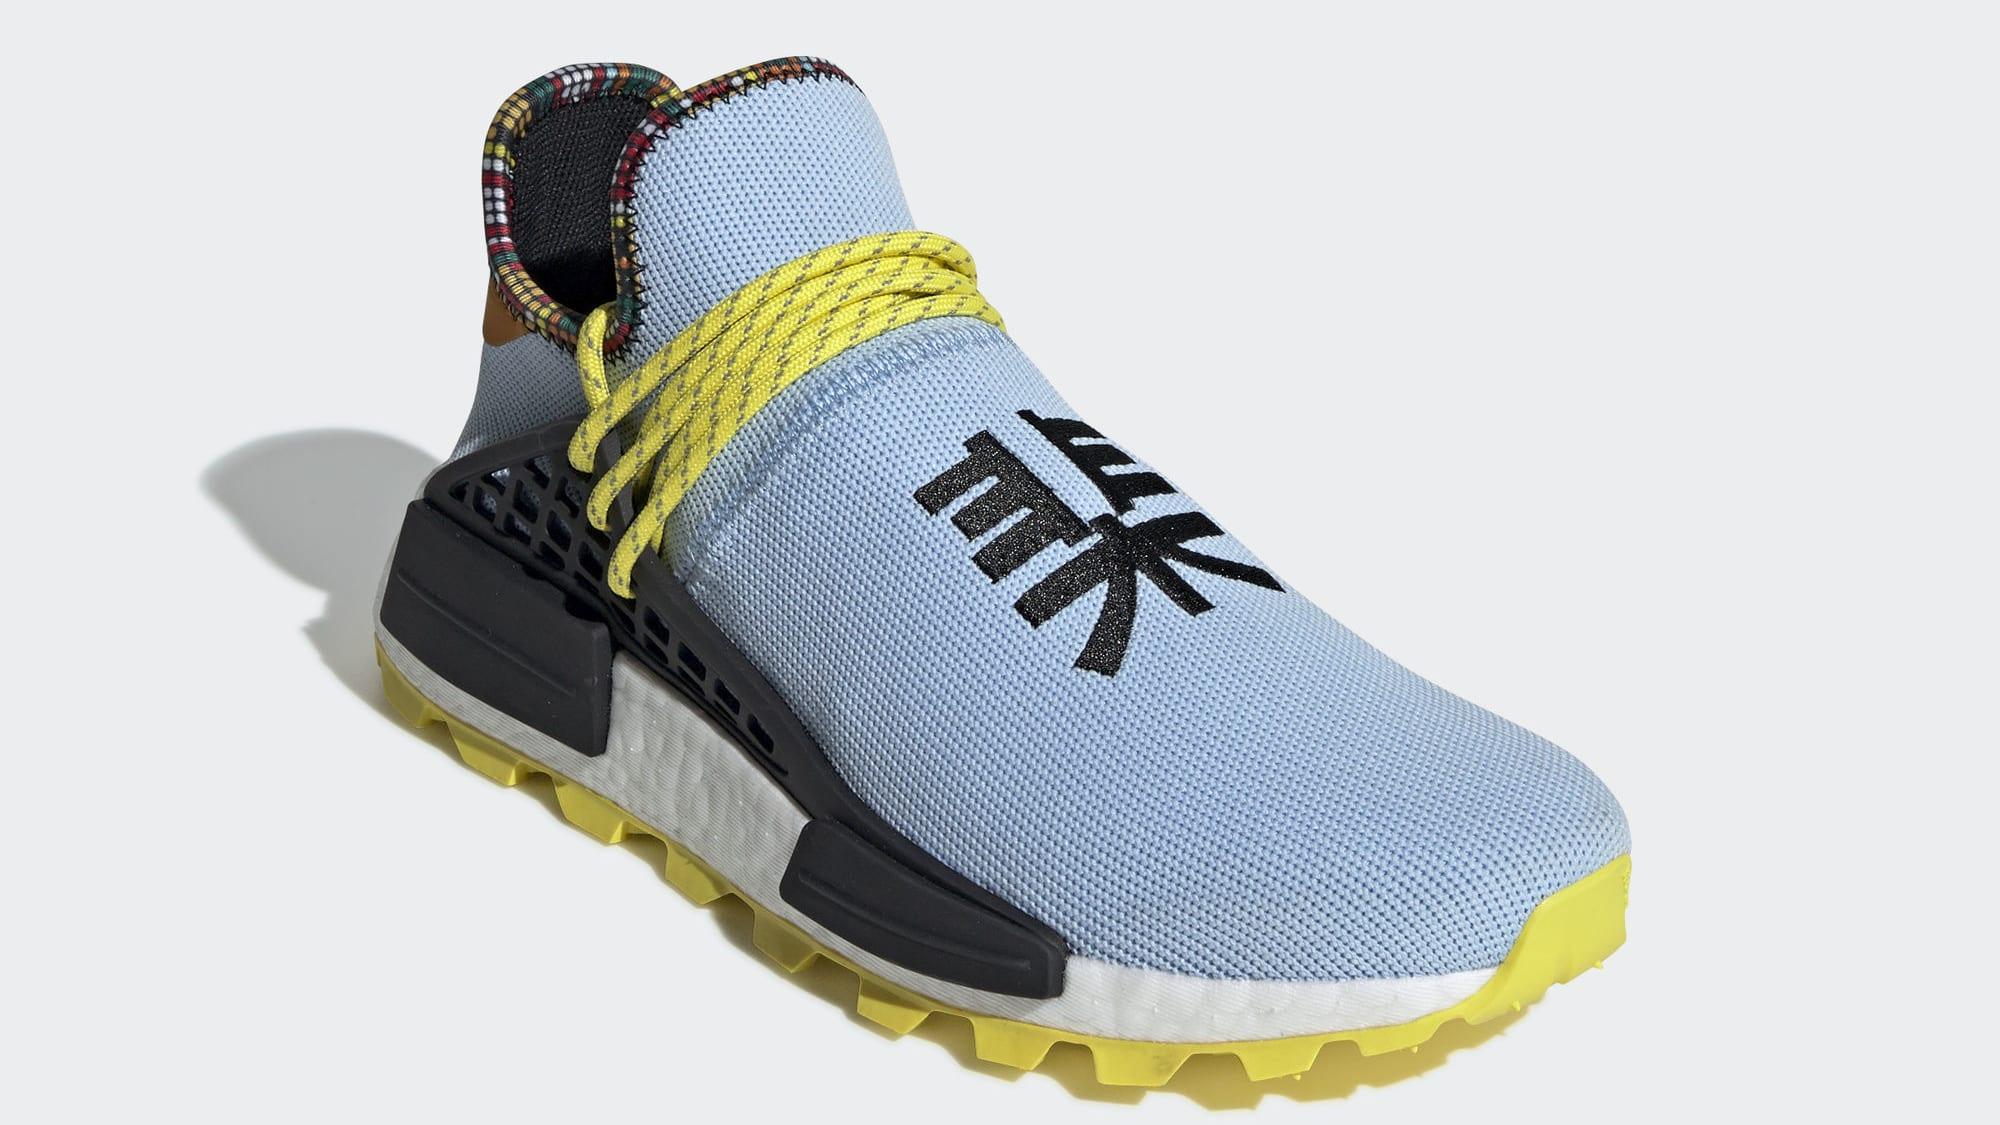 quality design 1f17d 77b5e Pharrell Williams x Adidas NMD Hu 'Inspiration' Pack Release ...